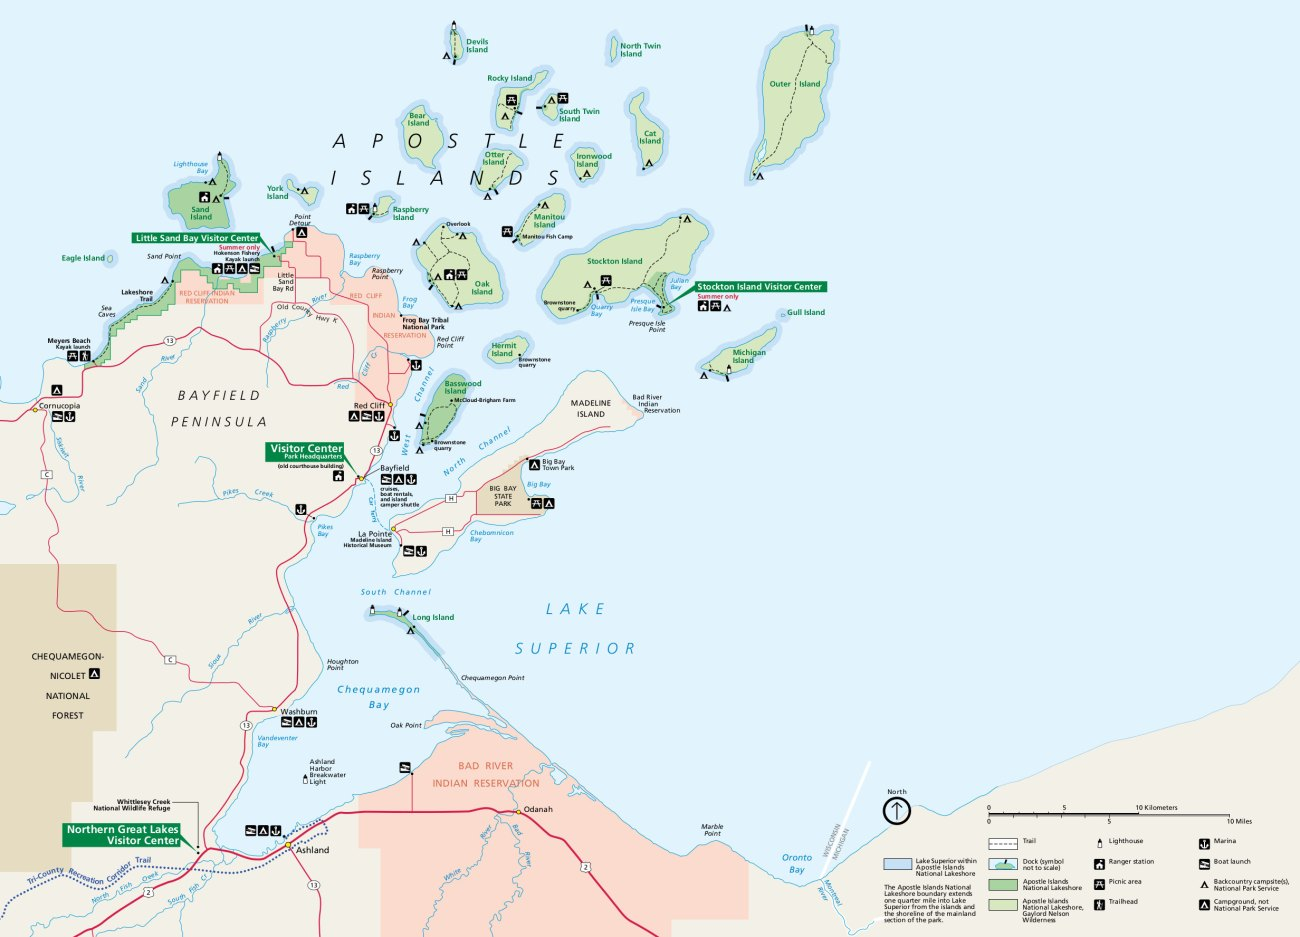 apostle-islands-map